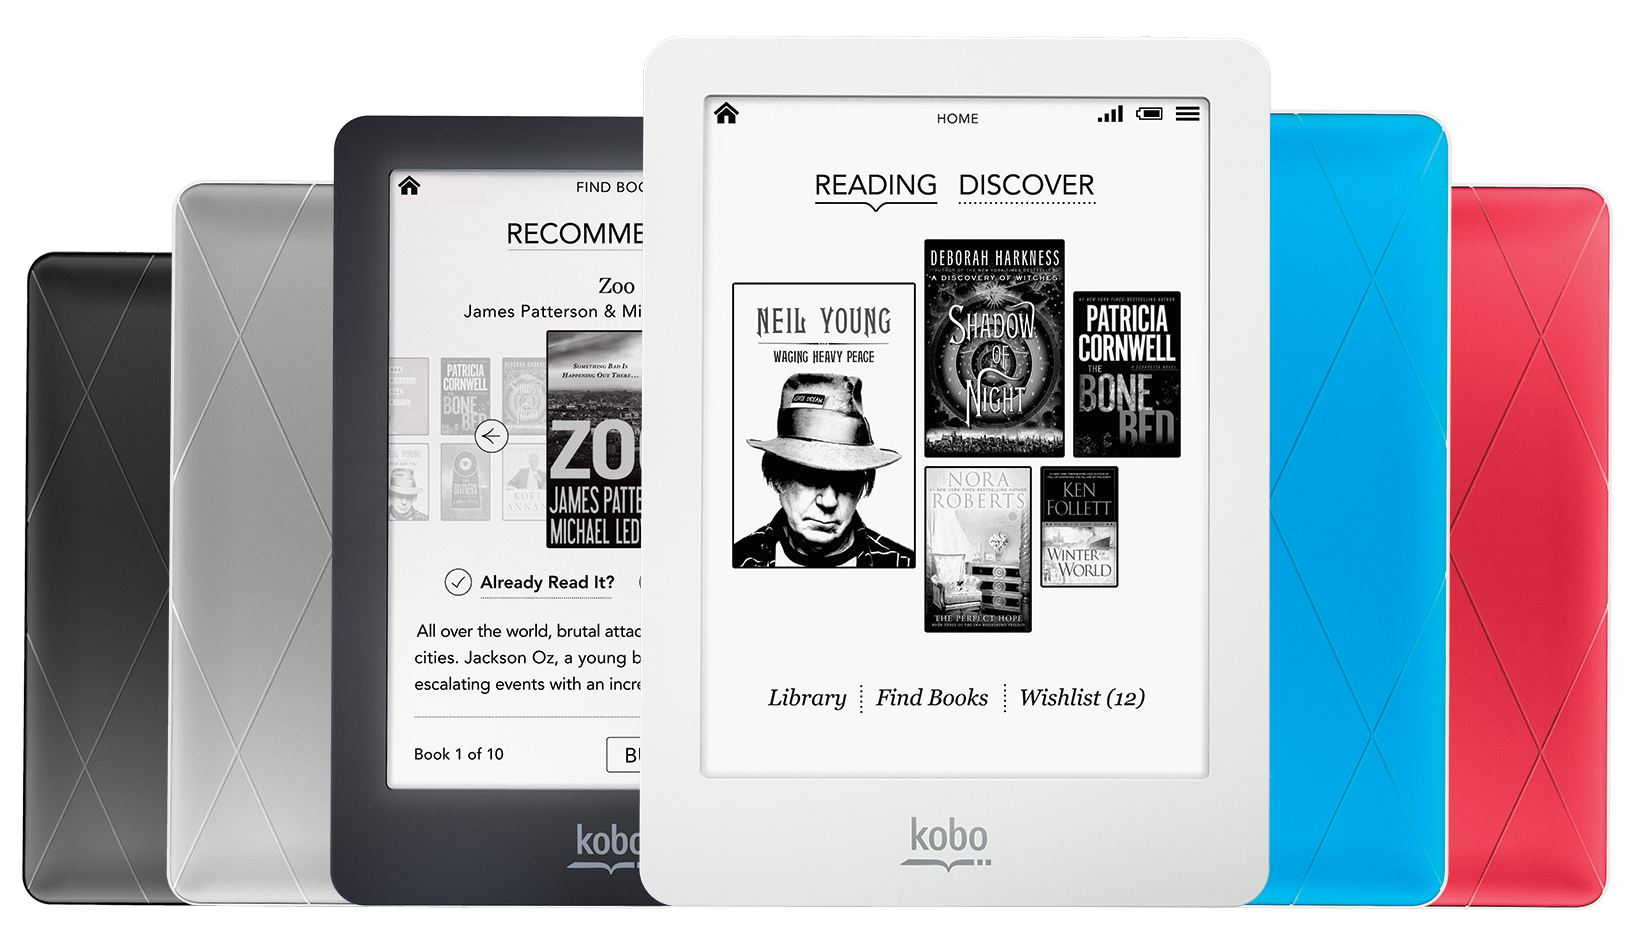 how to delete books from kobo ereader touch